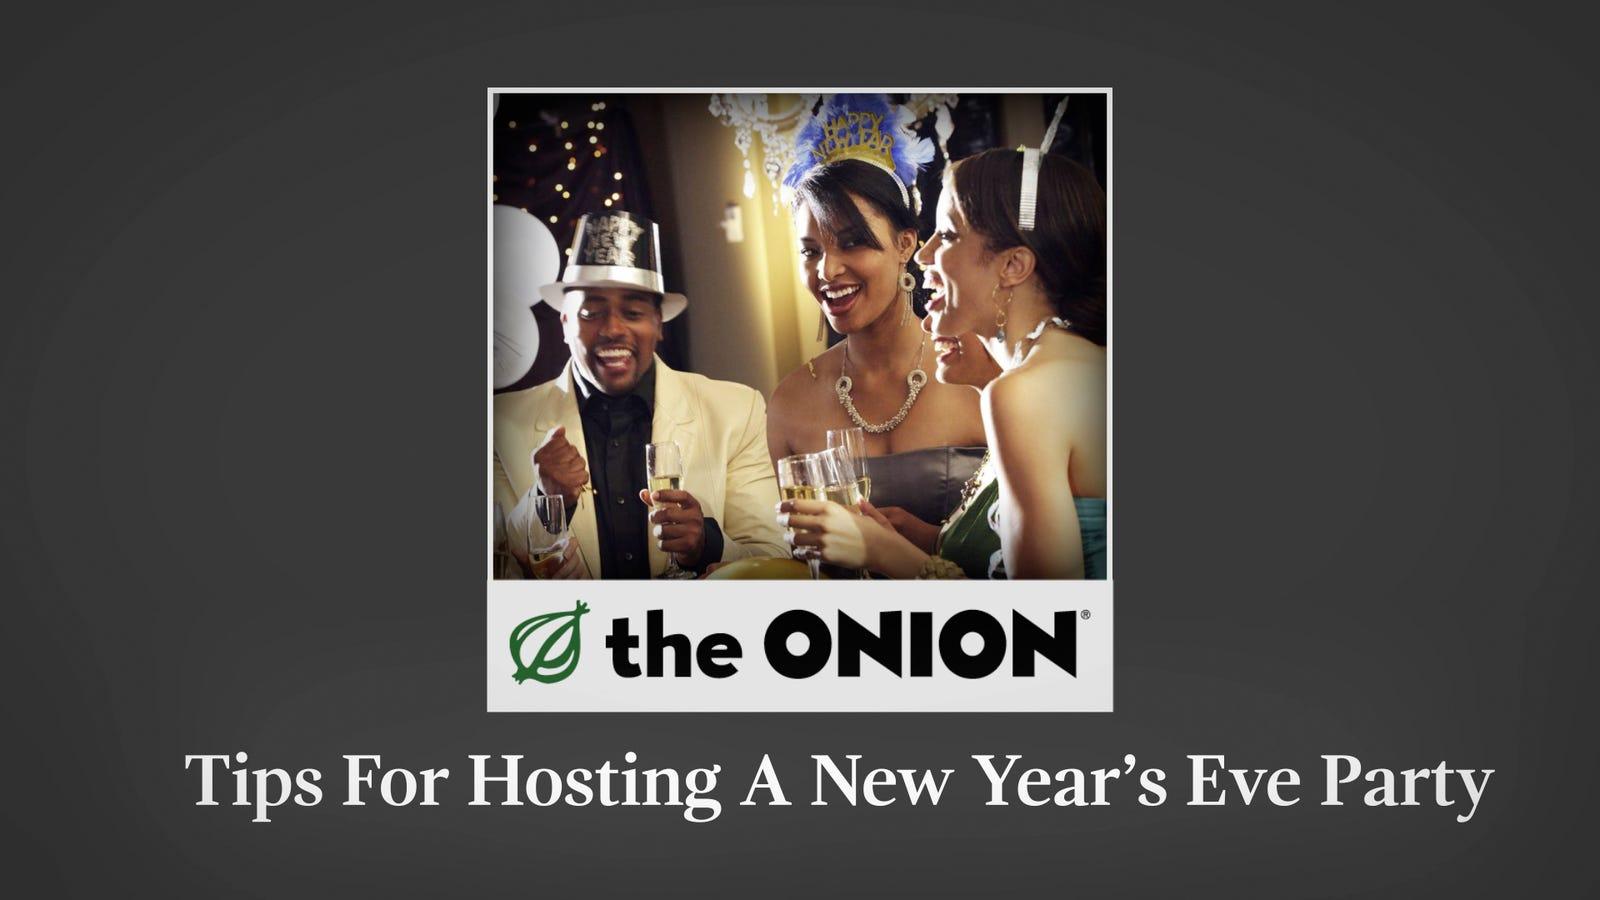 Onion хостинг изображений быстрый хостинг хранение файлов